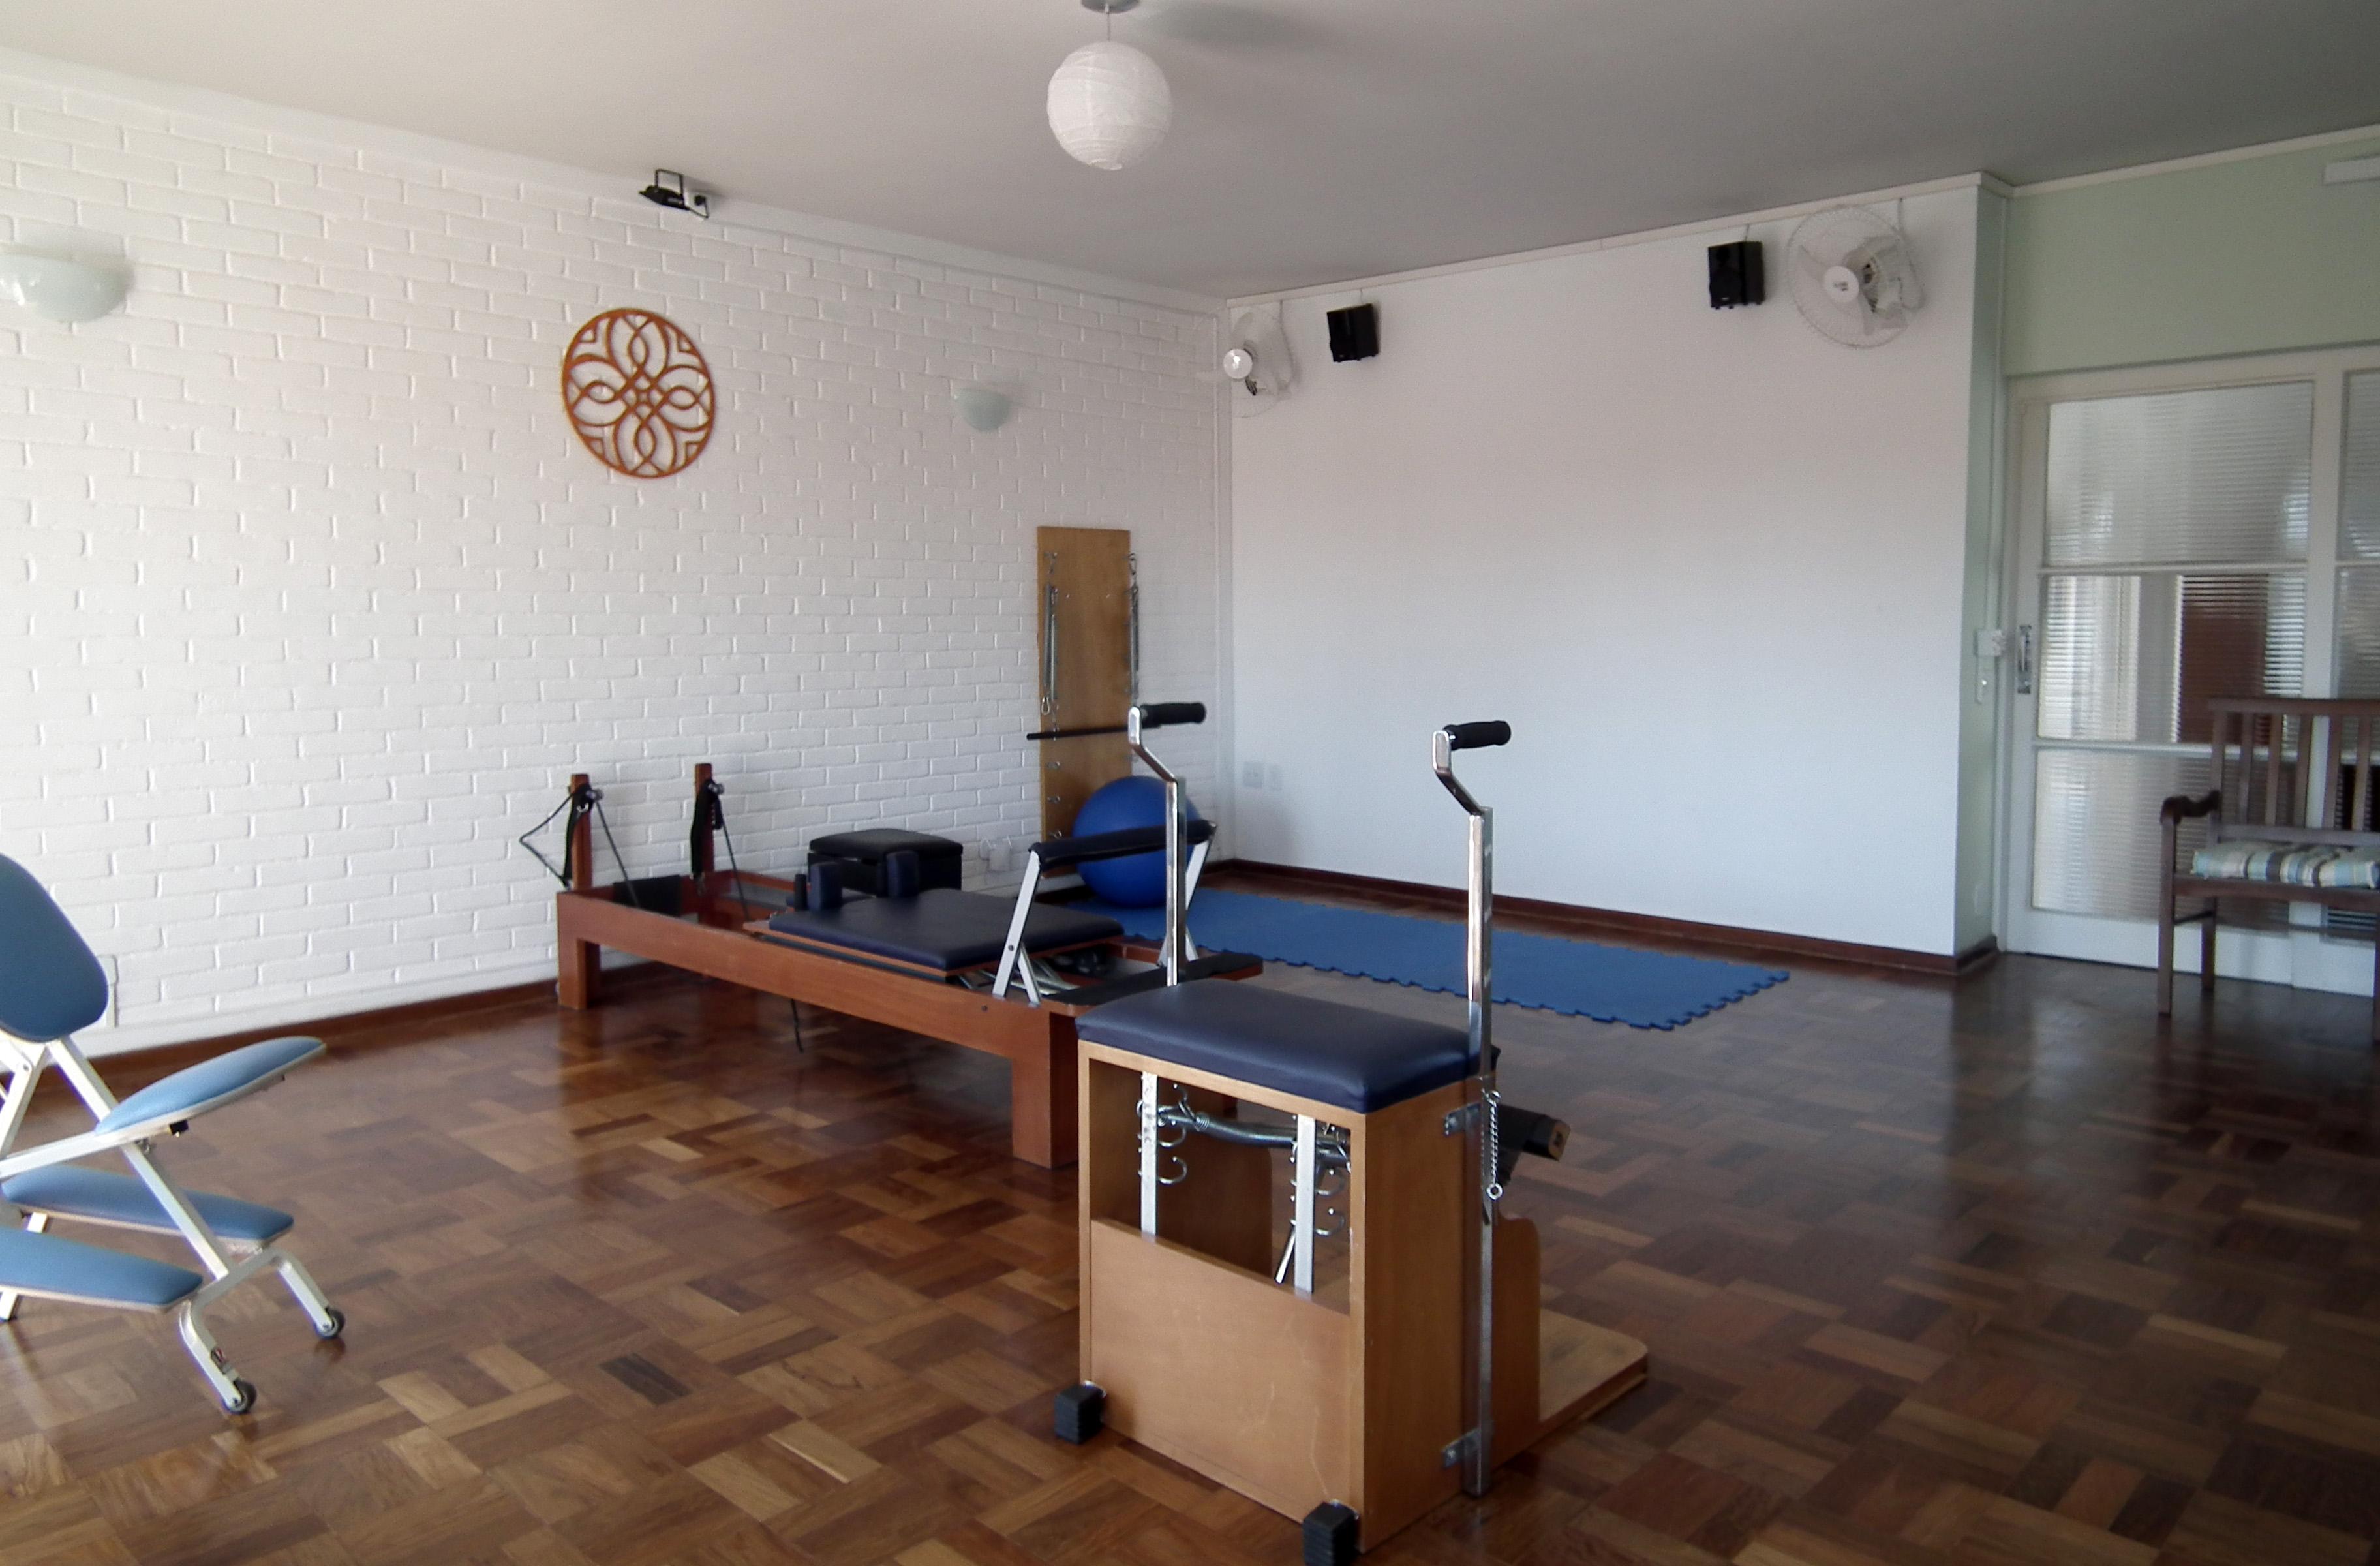 Pilates11.jpg